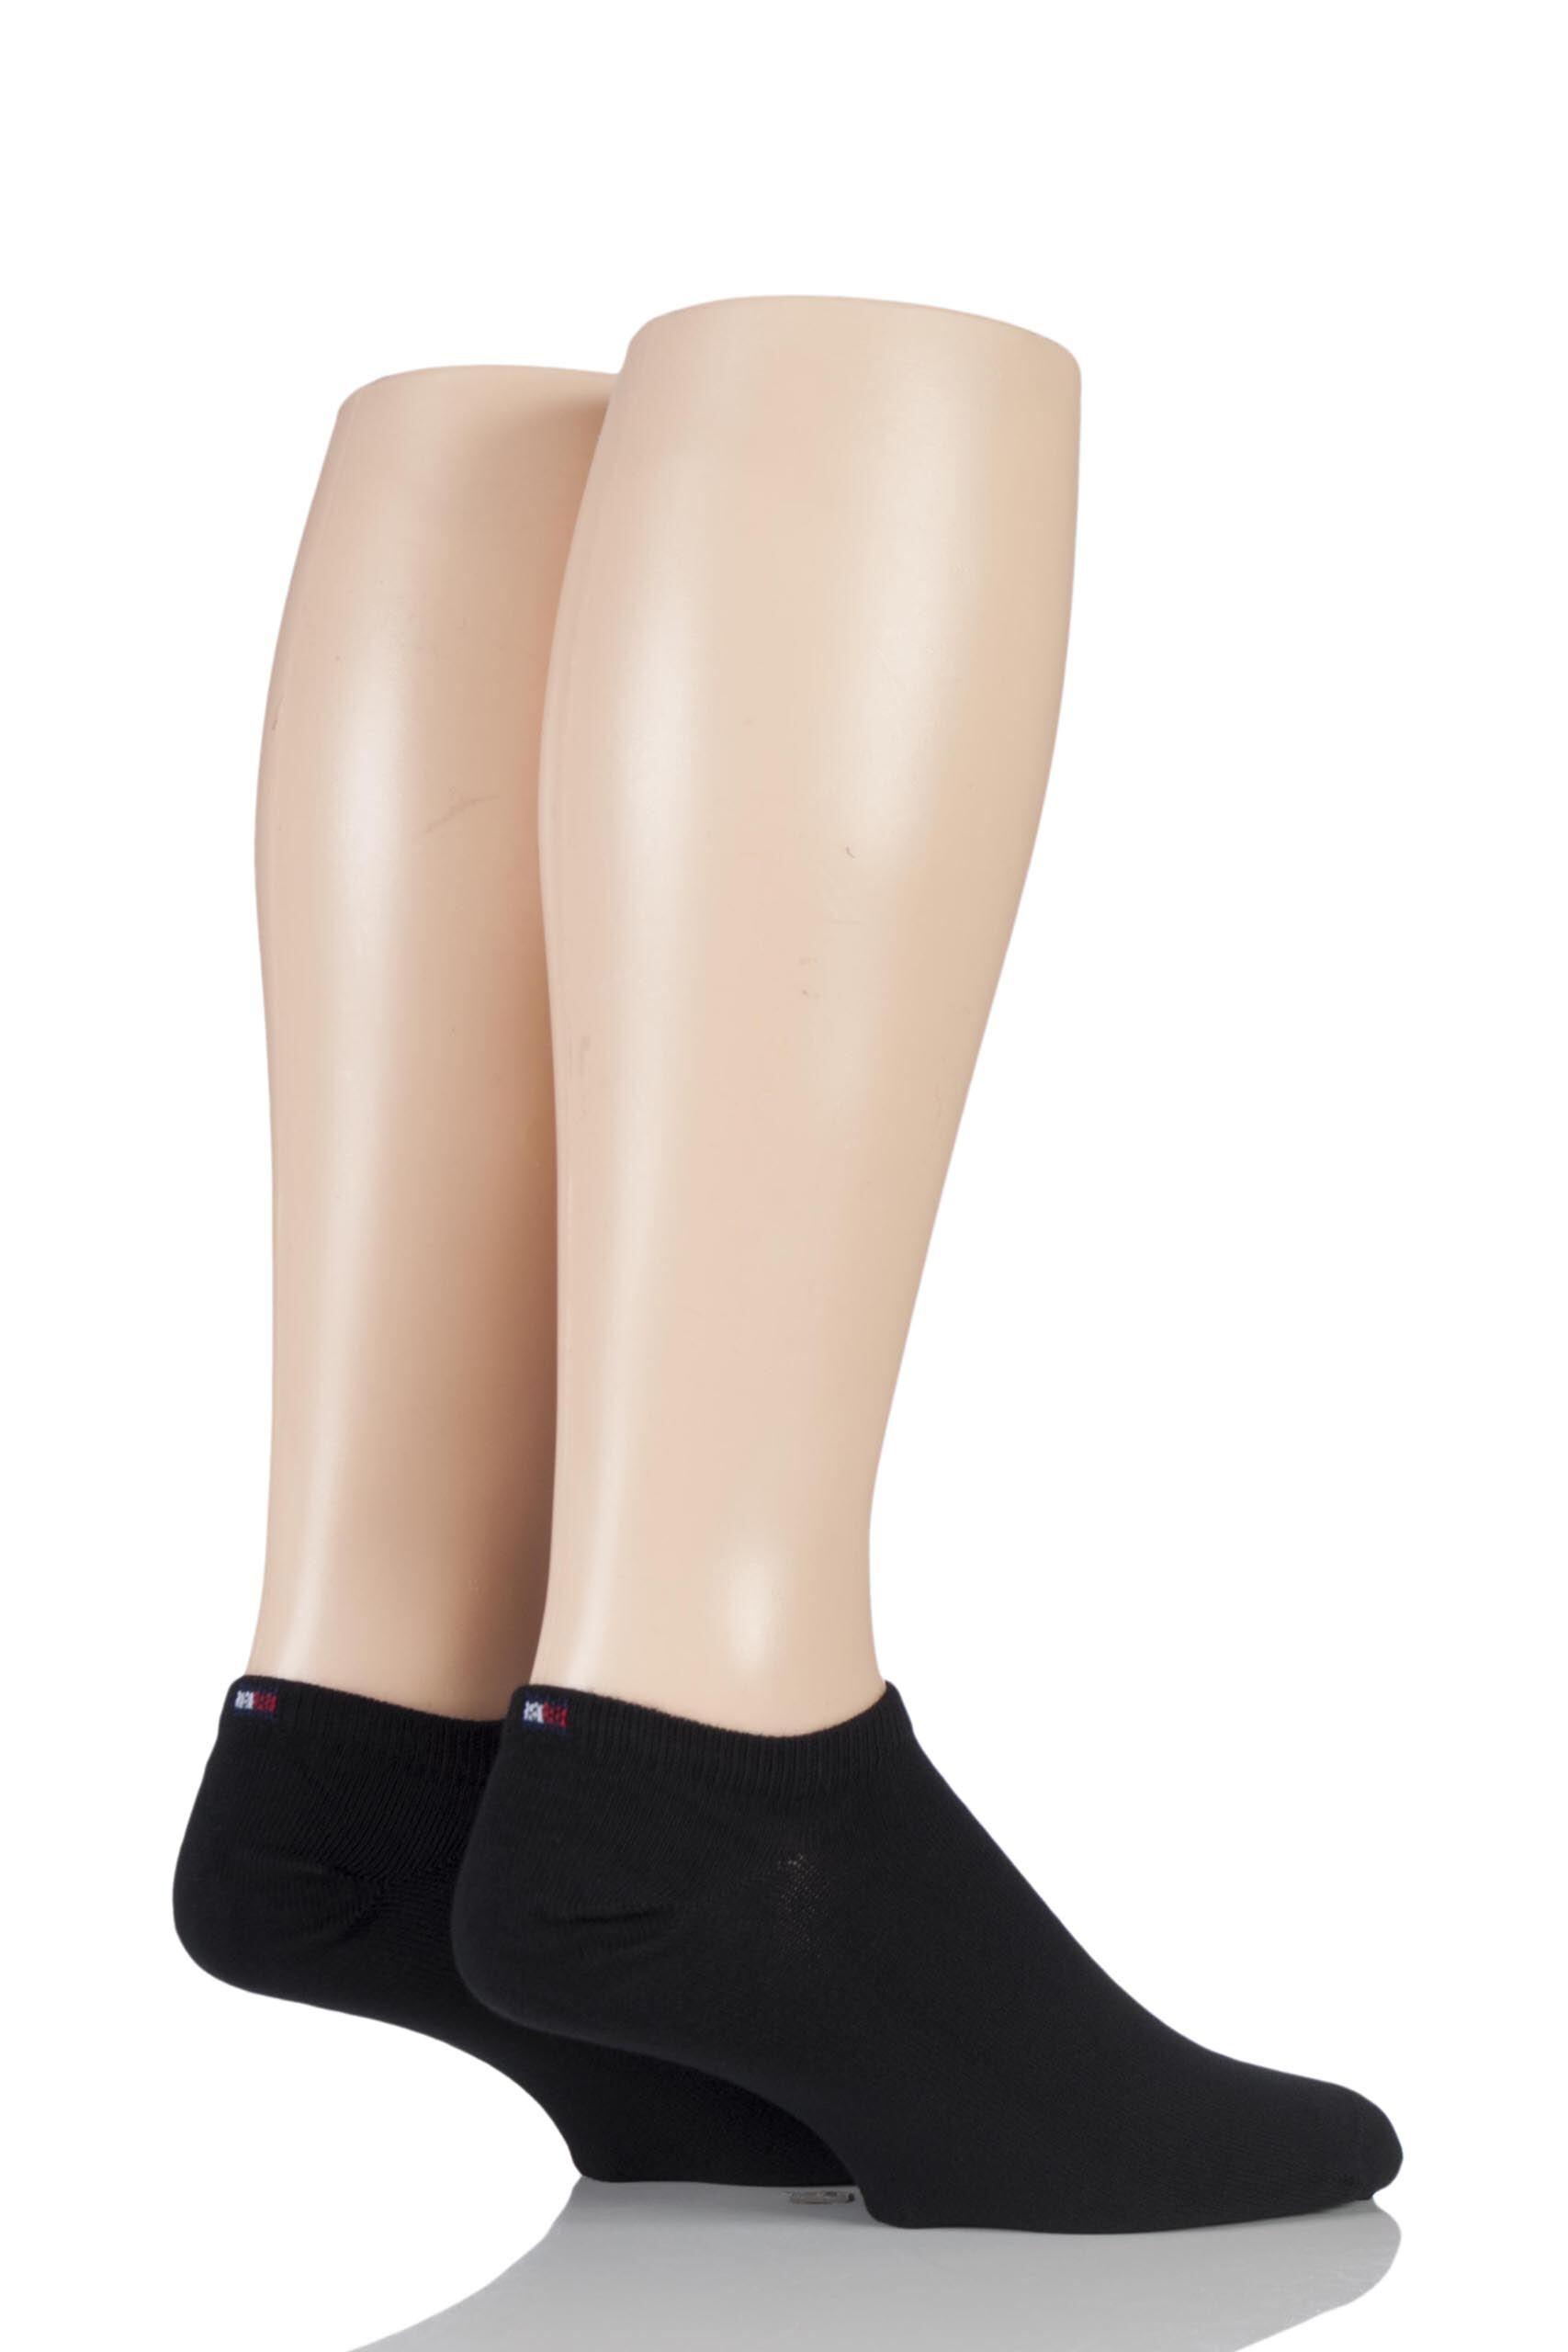 2 Pair Black Plain Cotton Sneaker Socks Men's 6-8 Mens - Tommy Hilfiger